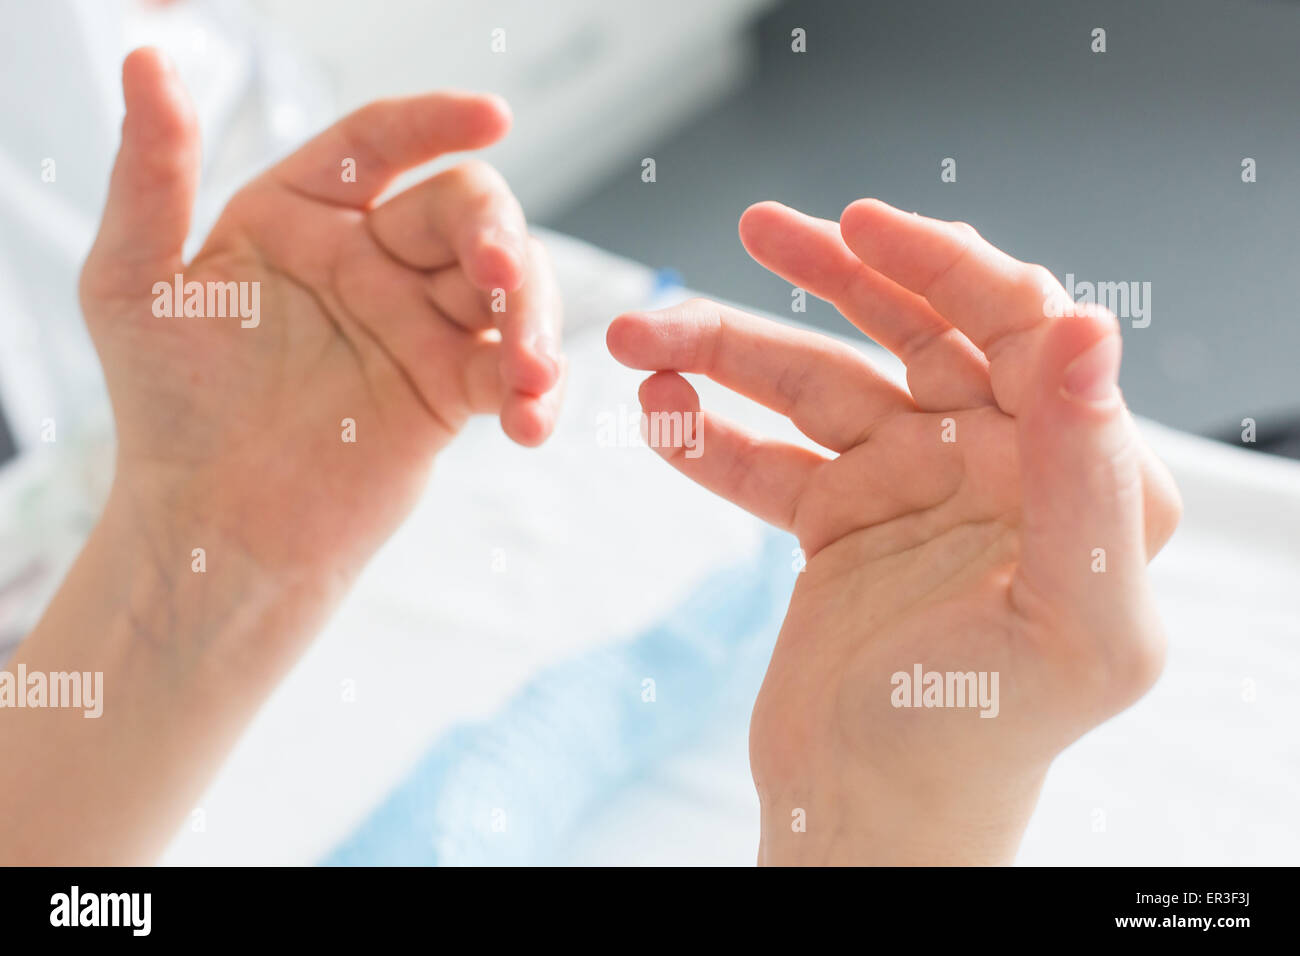 Hands of a woman with rheumatoid arthritis. - Stock Image